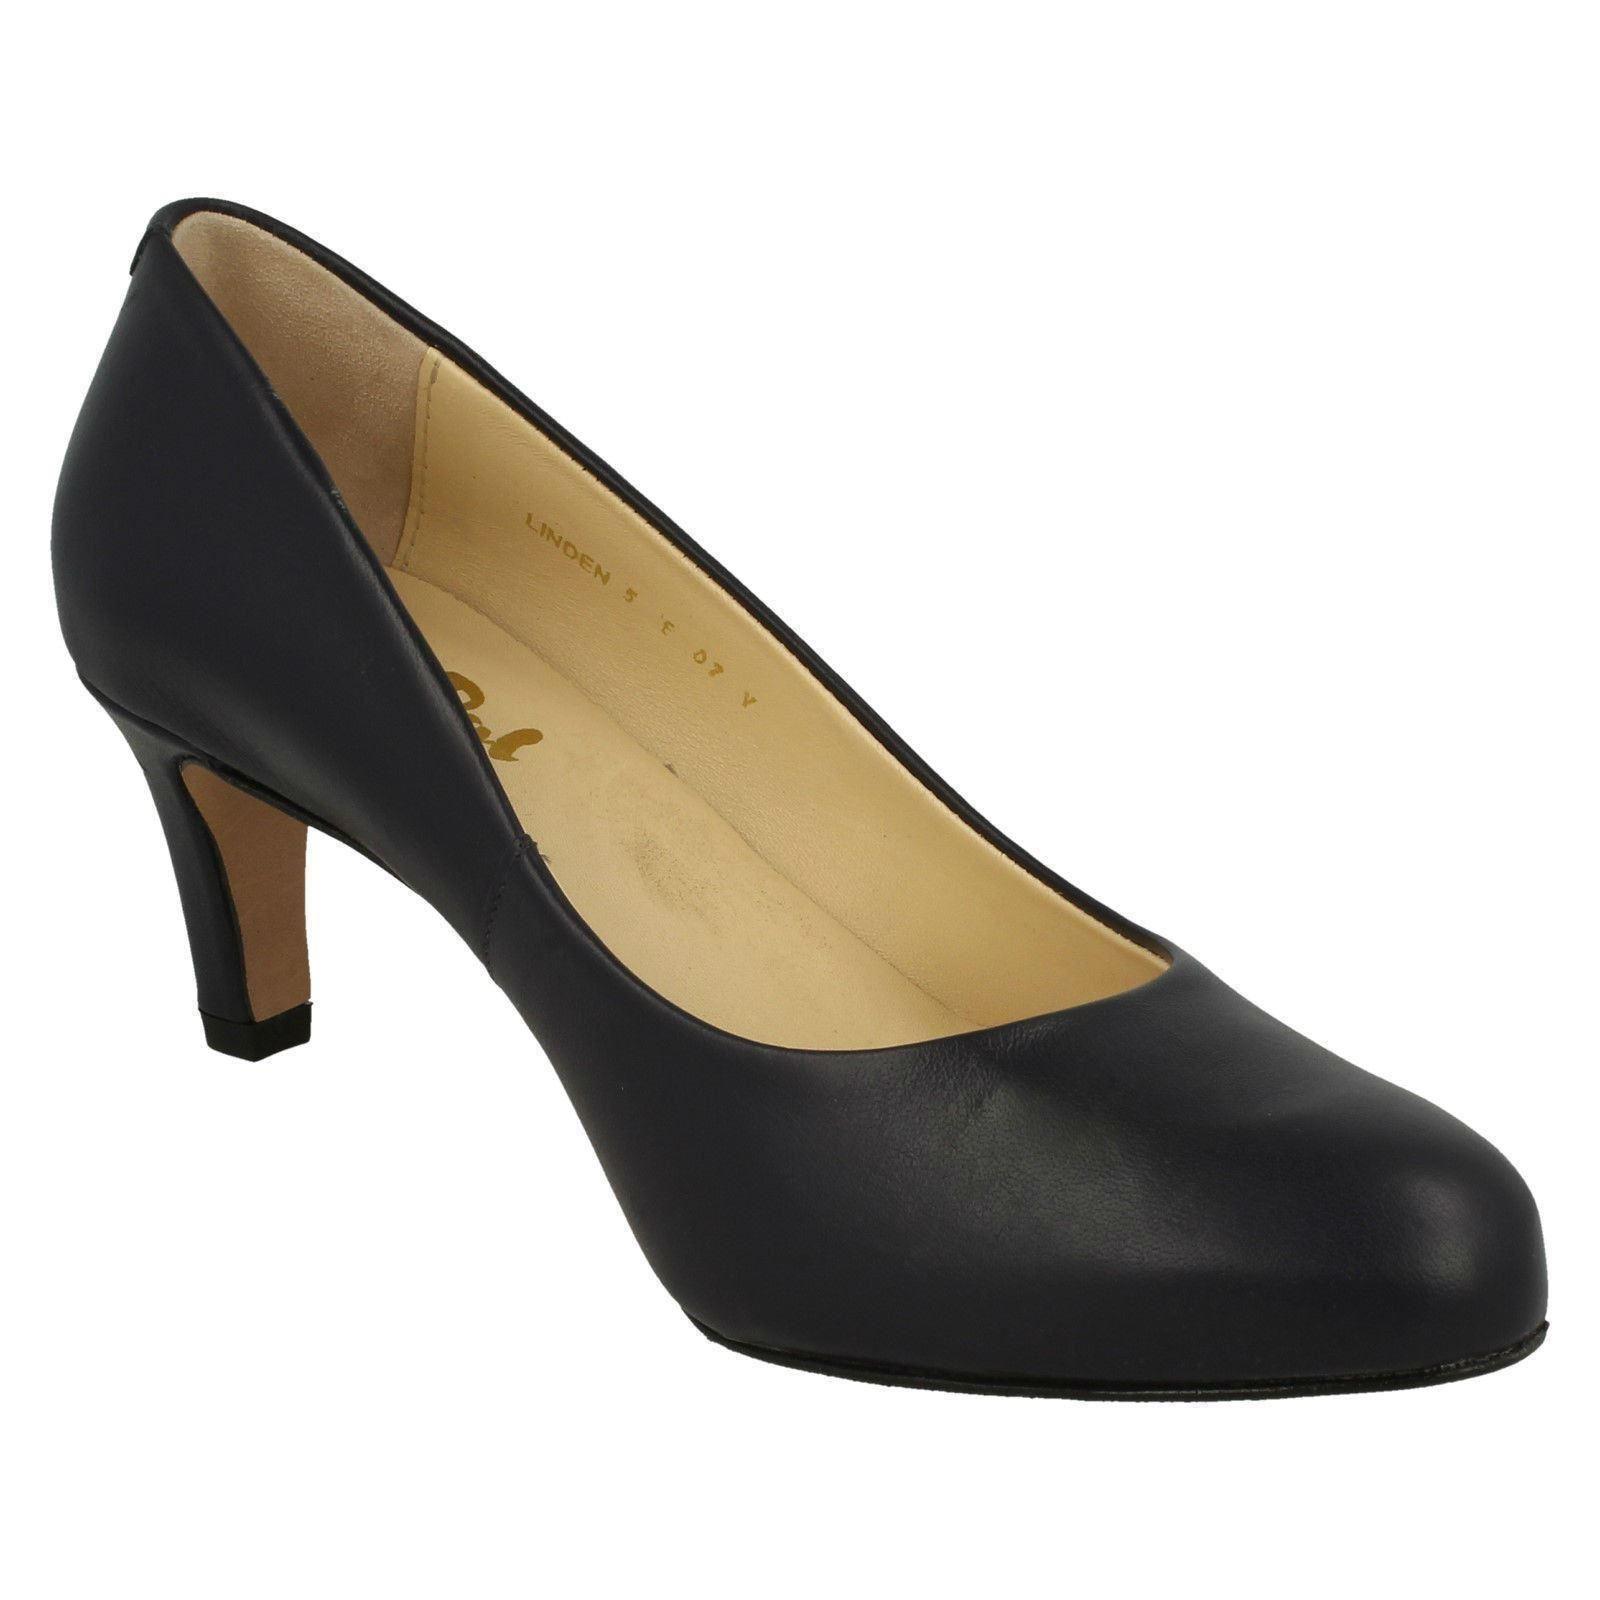 Señoras van dal Tribunal Zapatos Zapatos Zapatos Linden 8f58a6